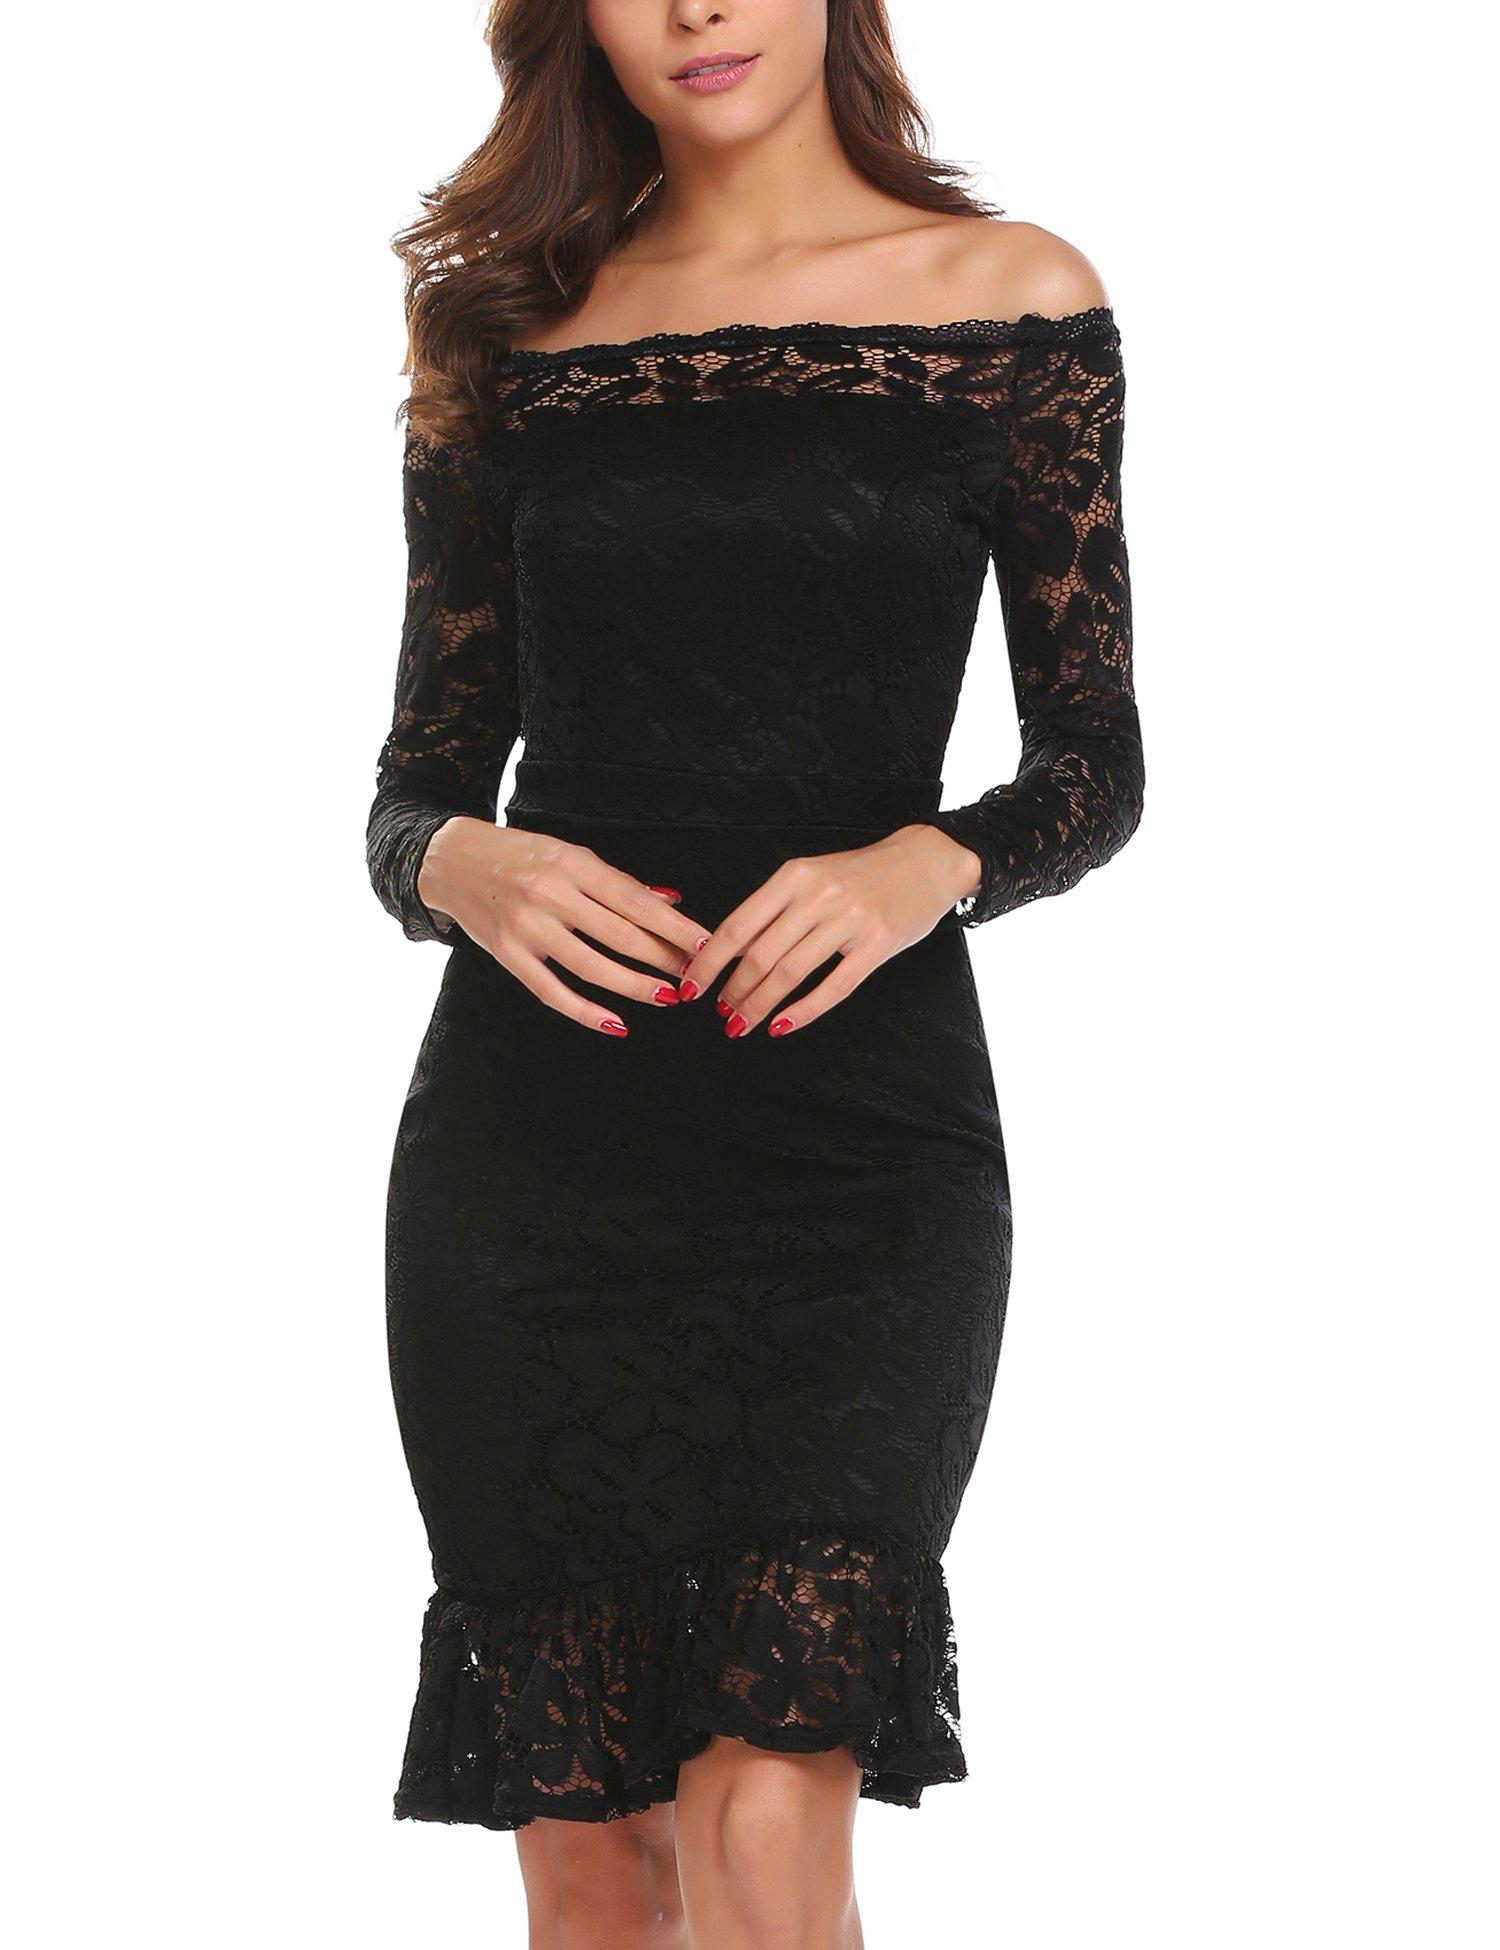 ANGVNS Women's Long Sleeve Full Flroal Lace Short Cocktail Dress Black M